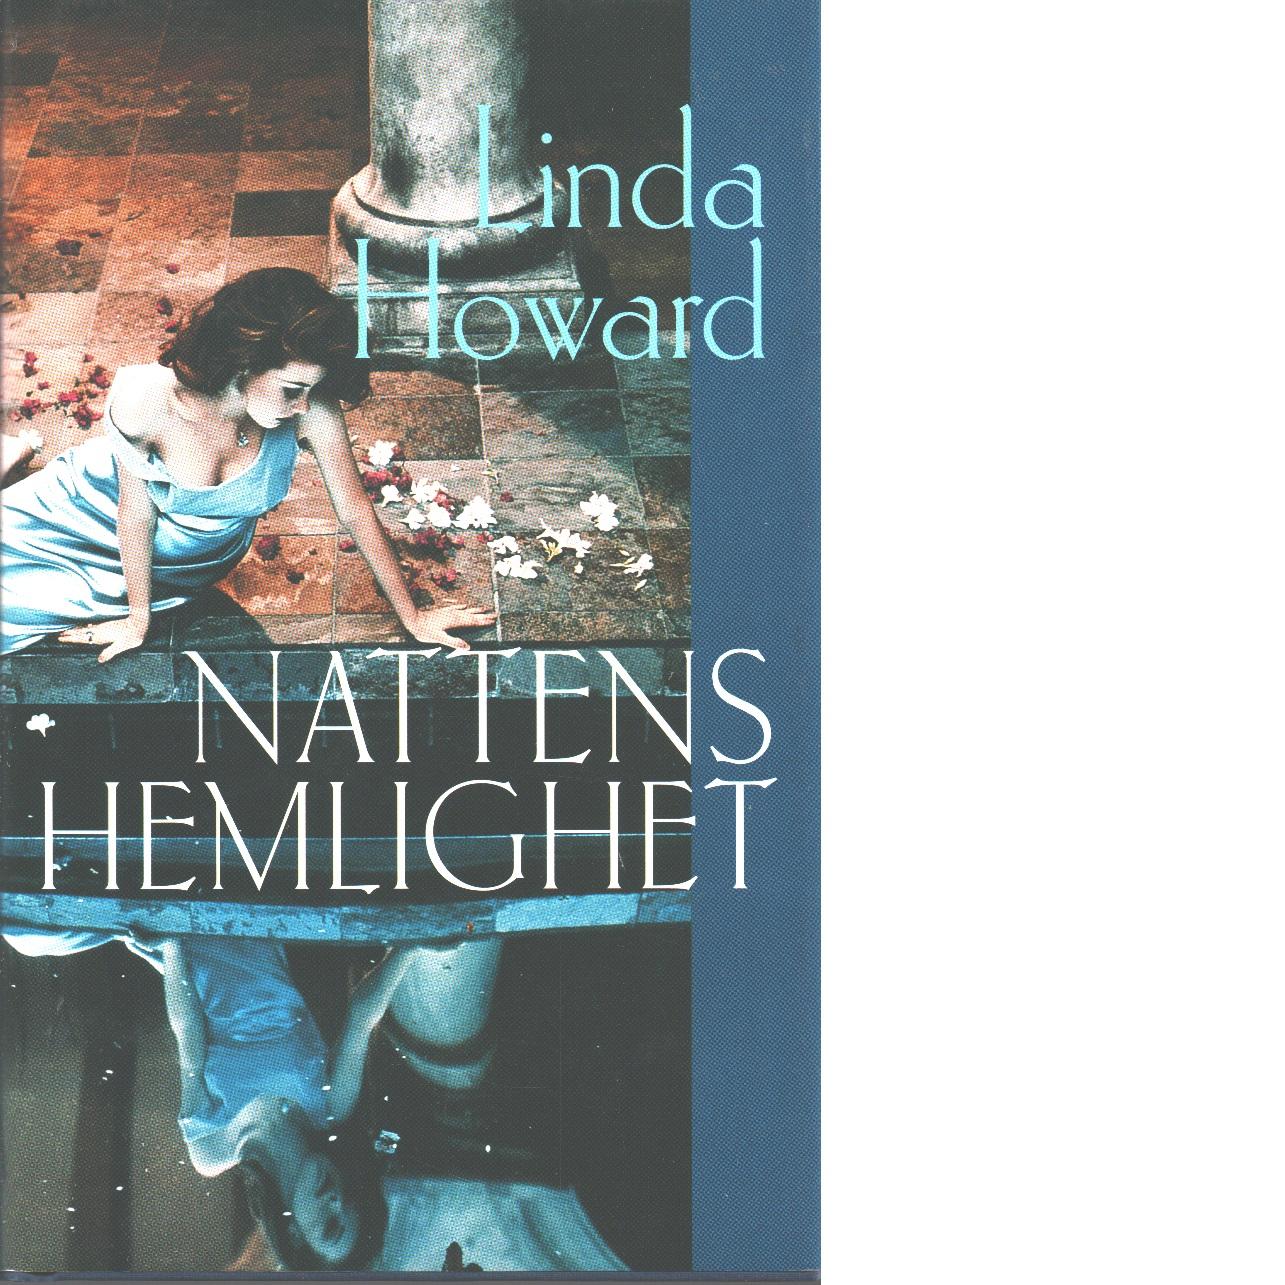 Nattens hemlighet - Howard, Linda